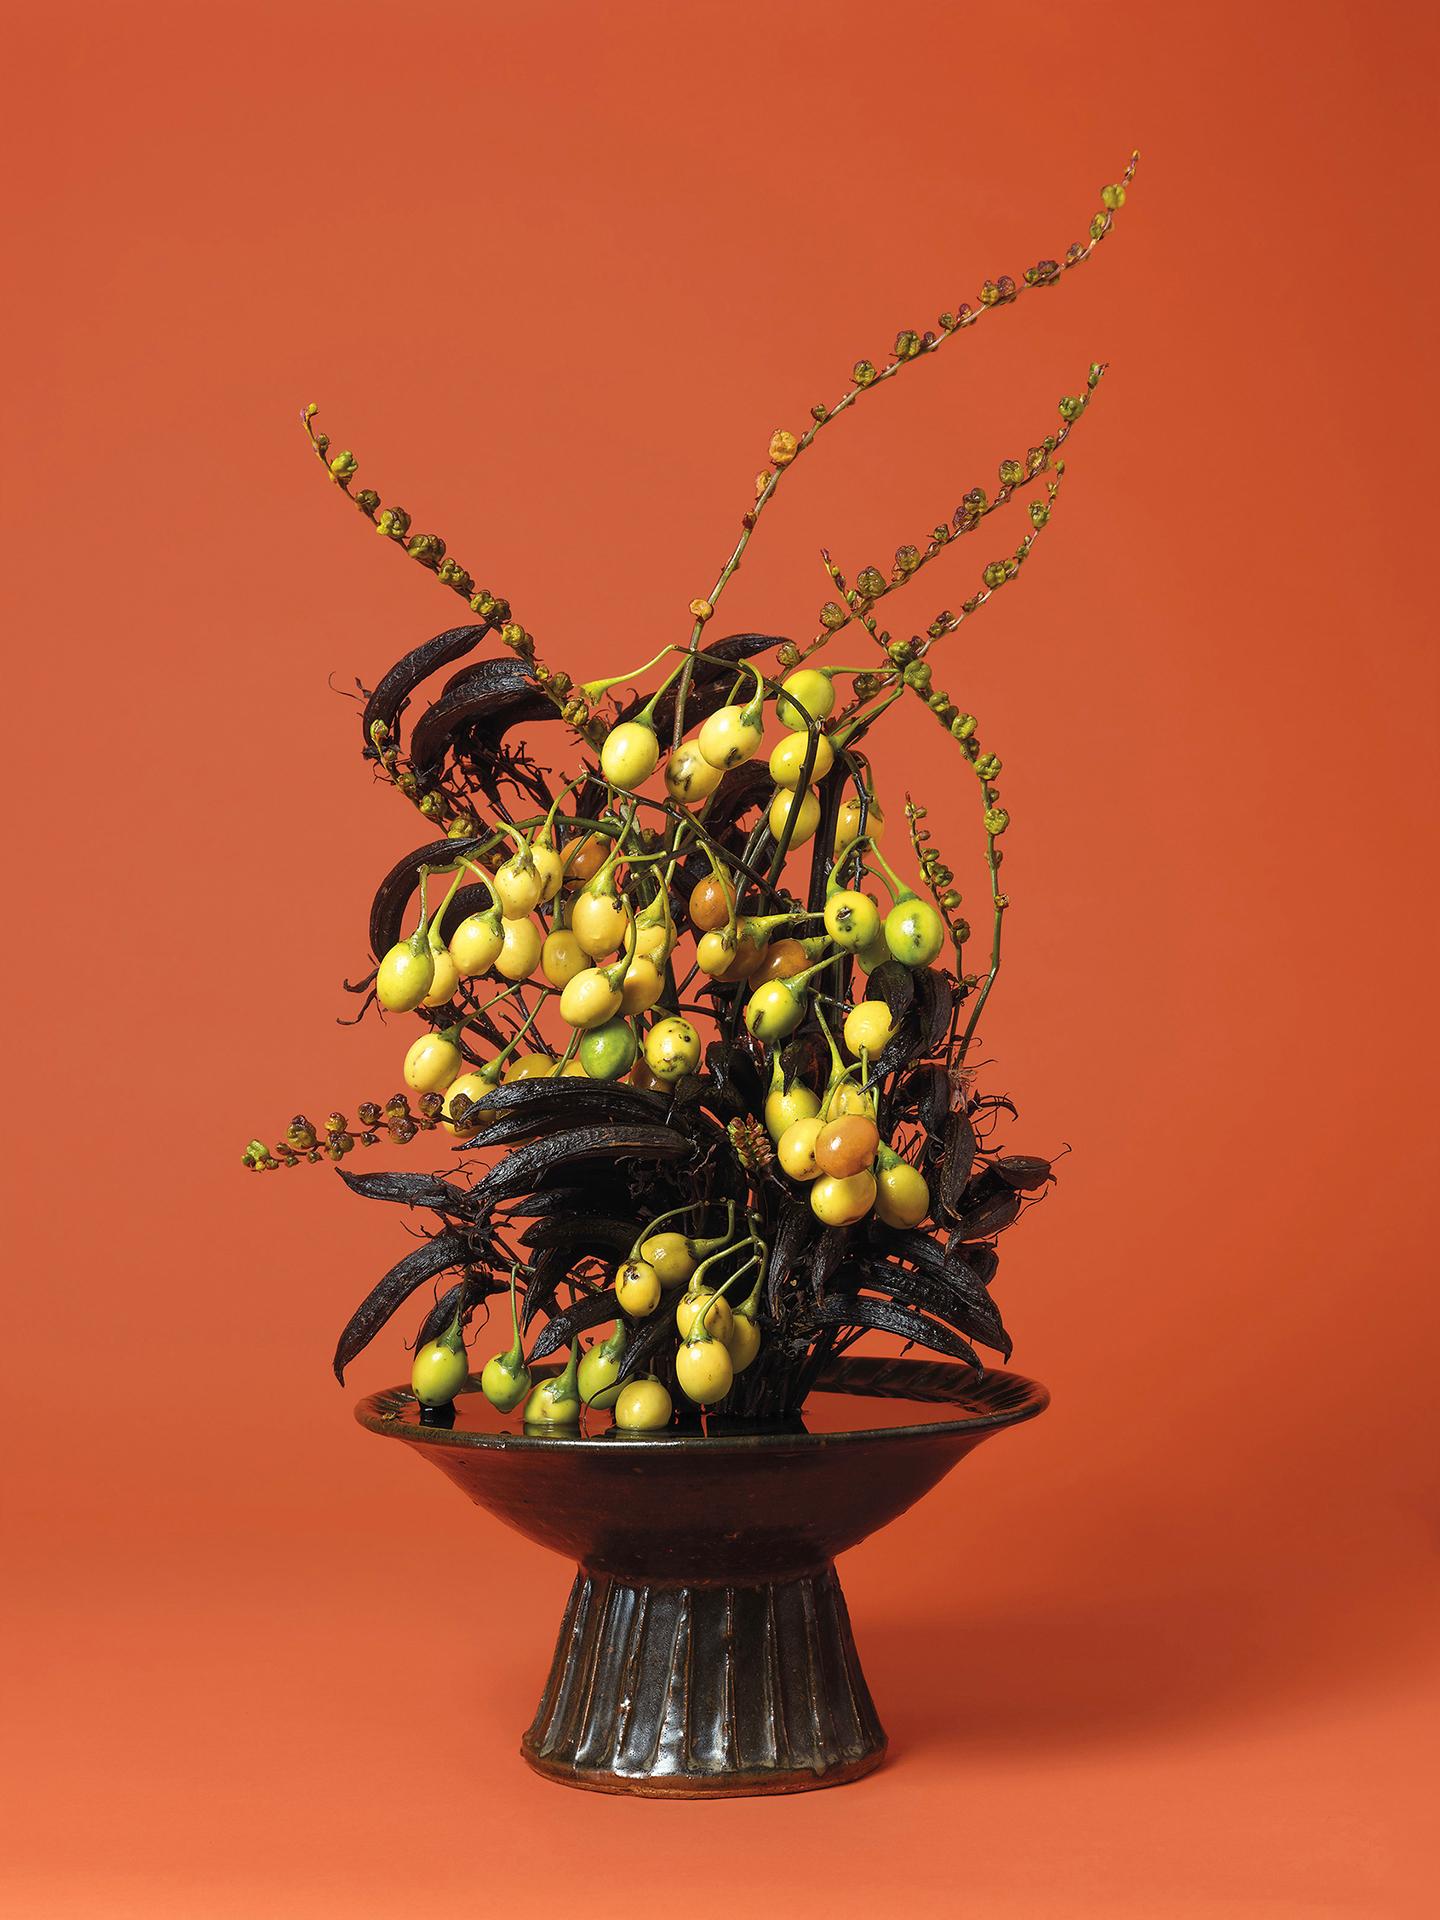 Ann Shelton 10. The Courtesan, Poroporo (Solanum sp.) ©Ann Sheltonsm1